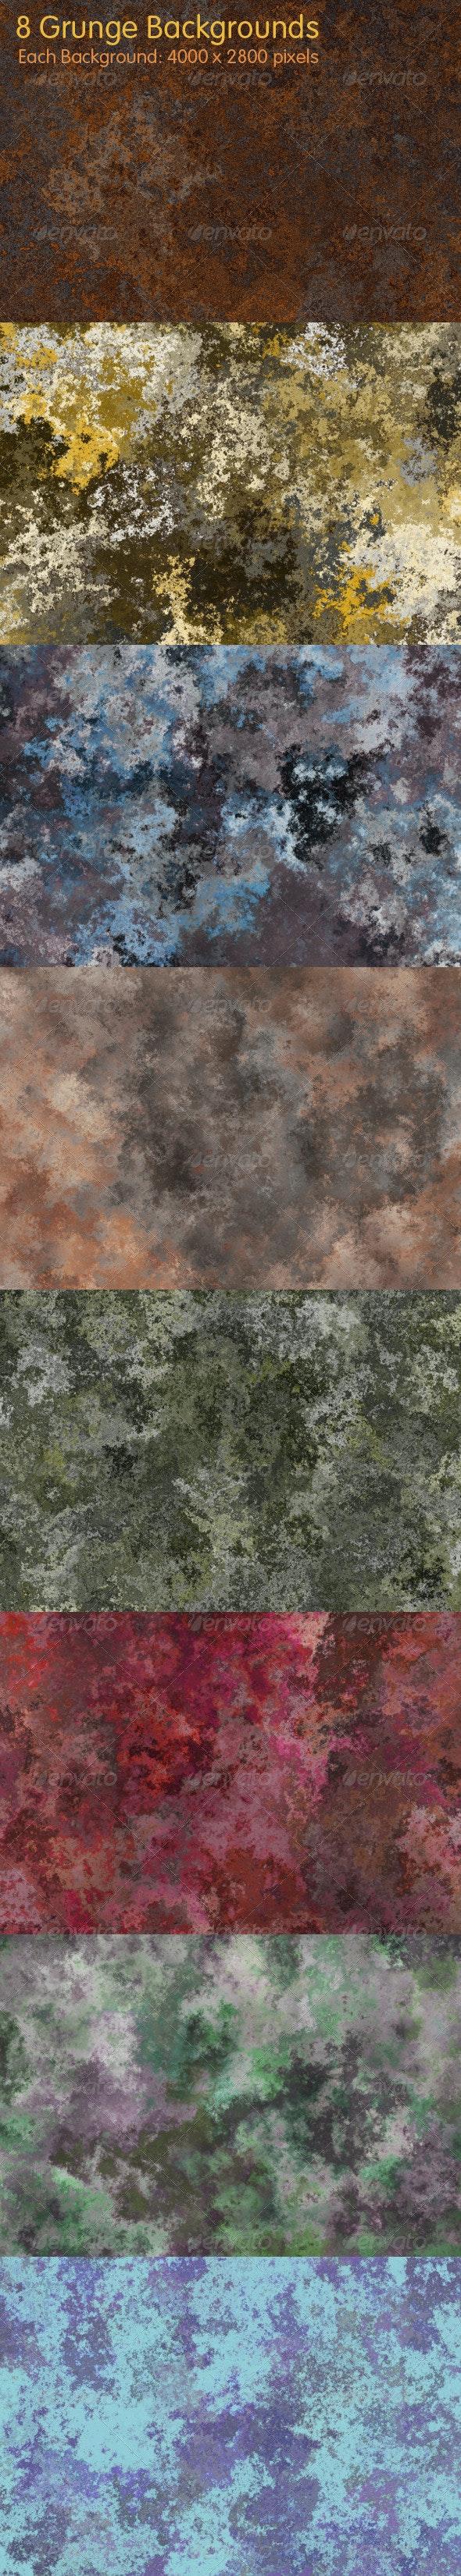 8 Grunge Backgrounds - Industrial / Grunge Textures